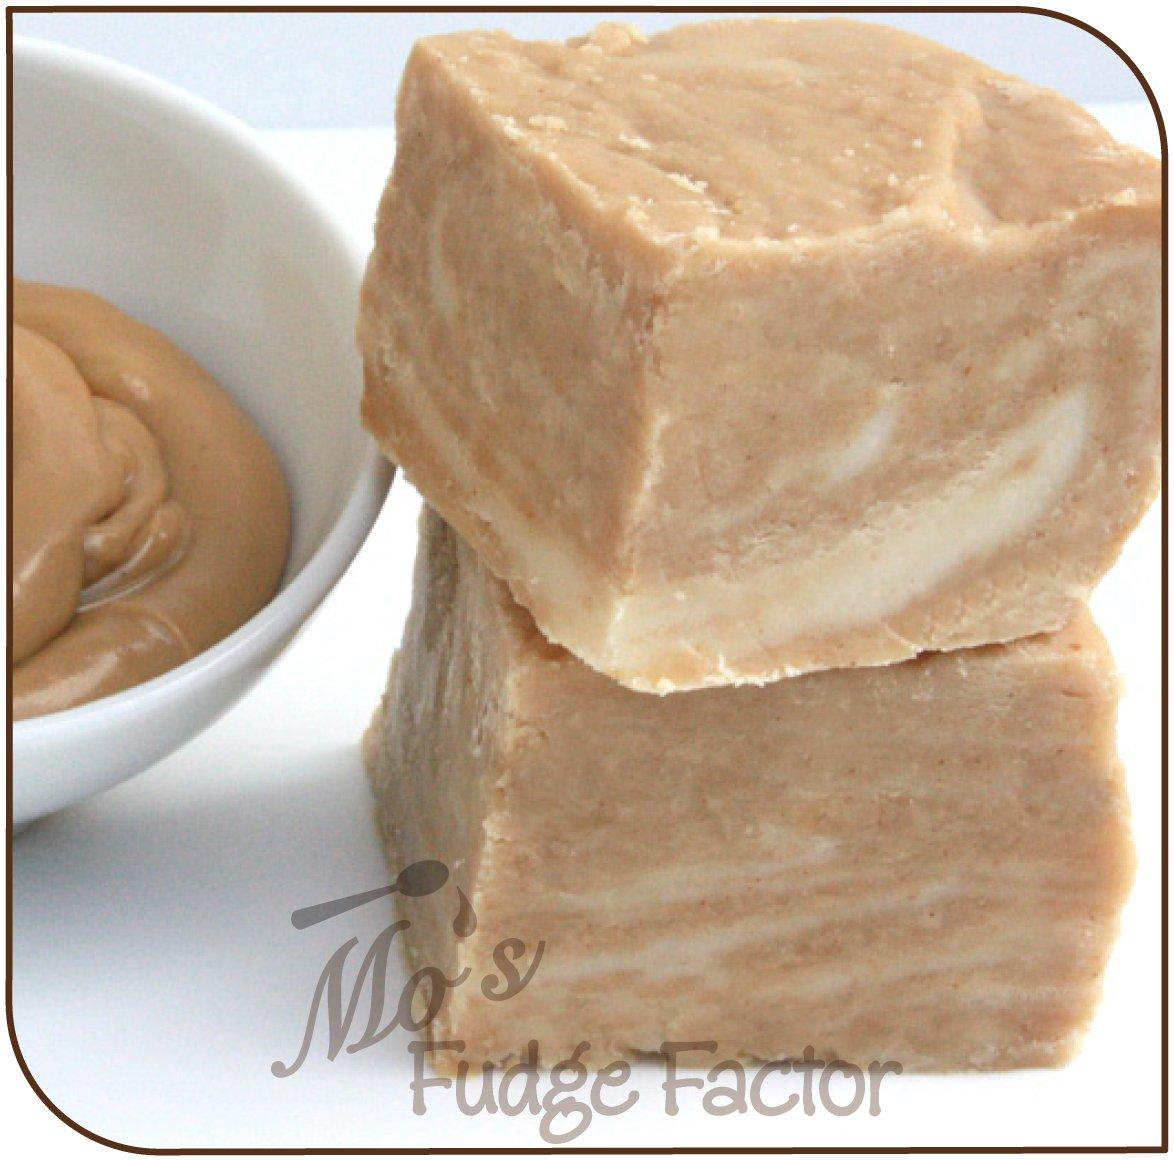 Mos Fudge Factor, Peanut Butter Fudge 1 Pound